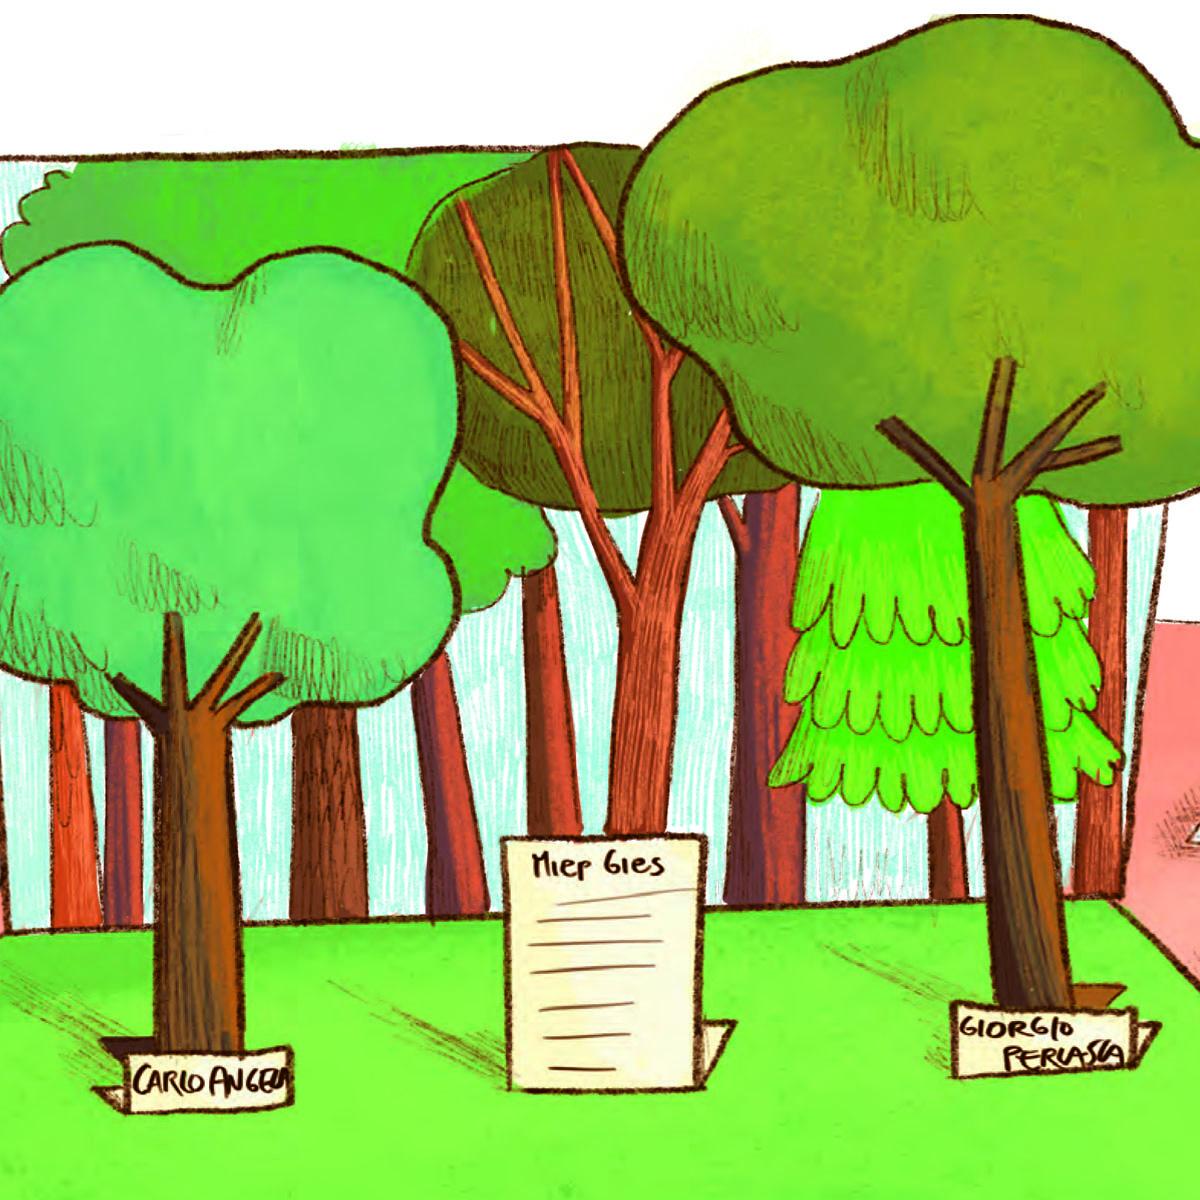 Gli alberi del giardino dei giusti